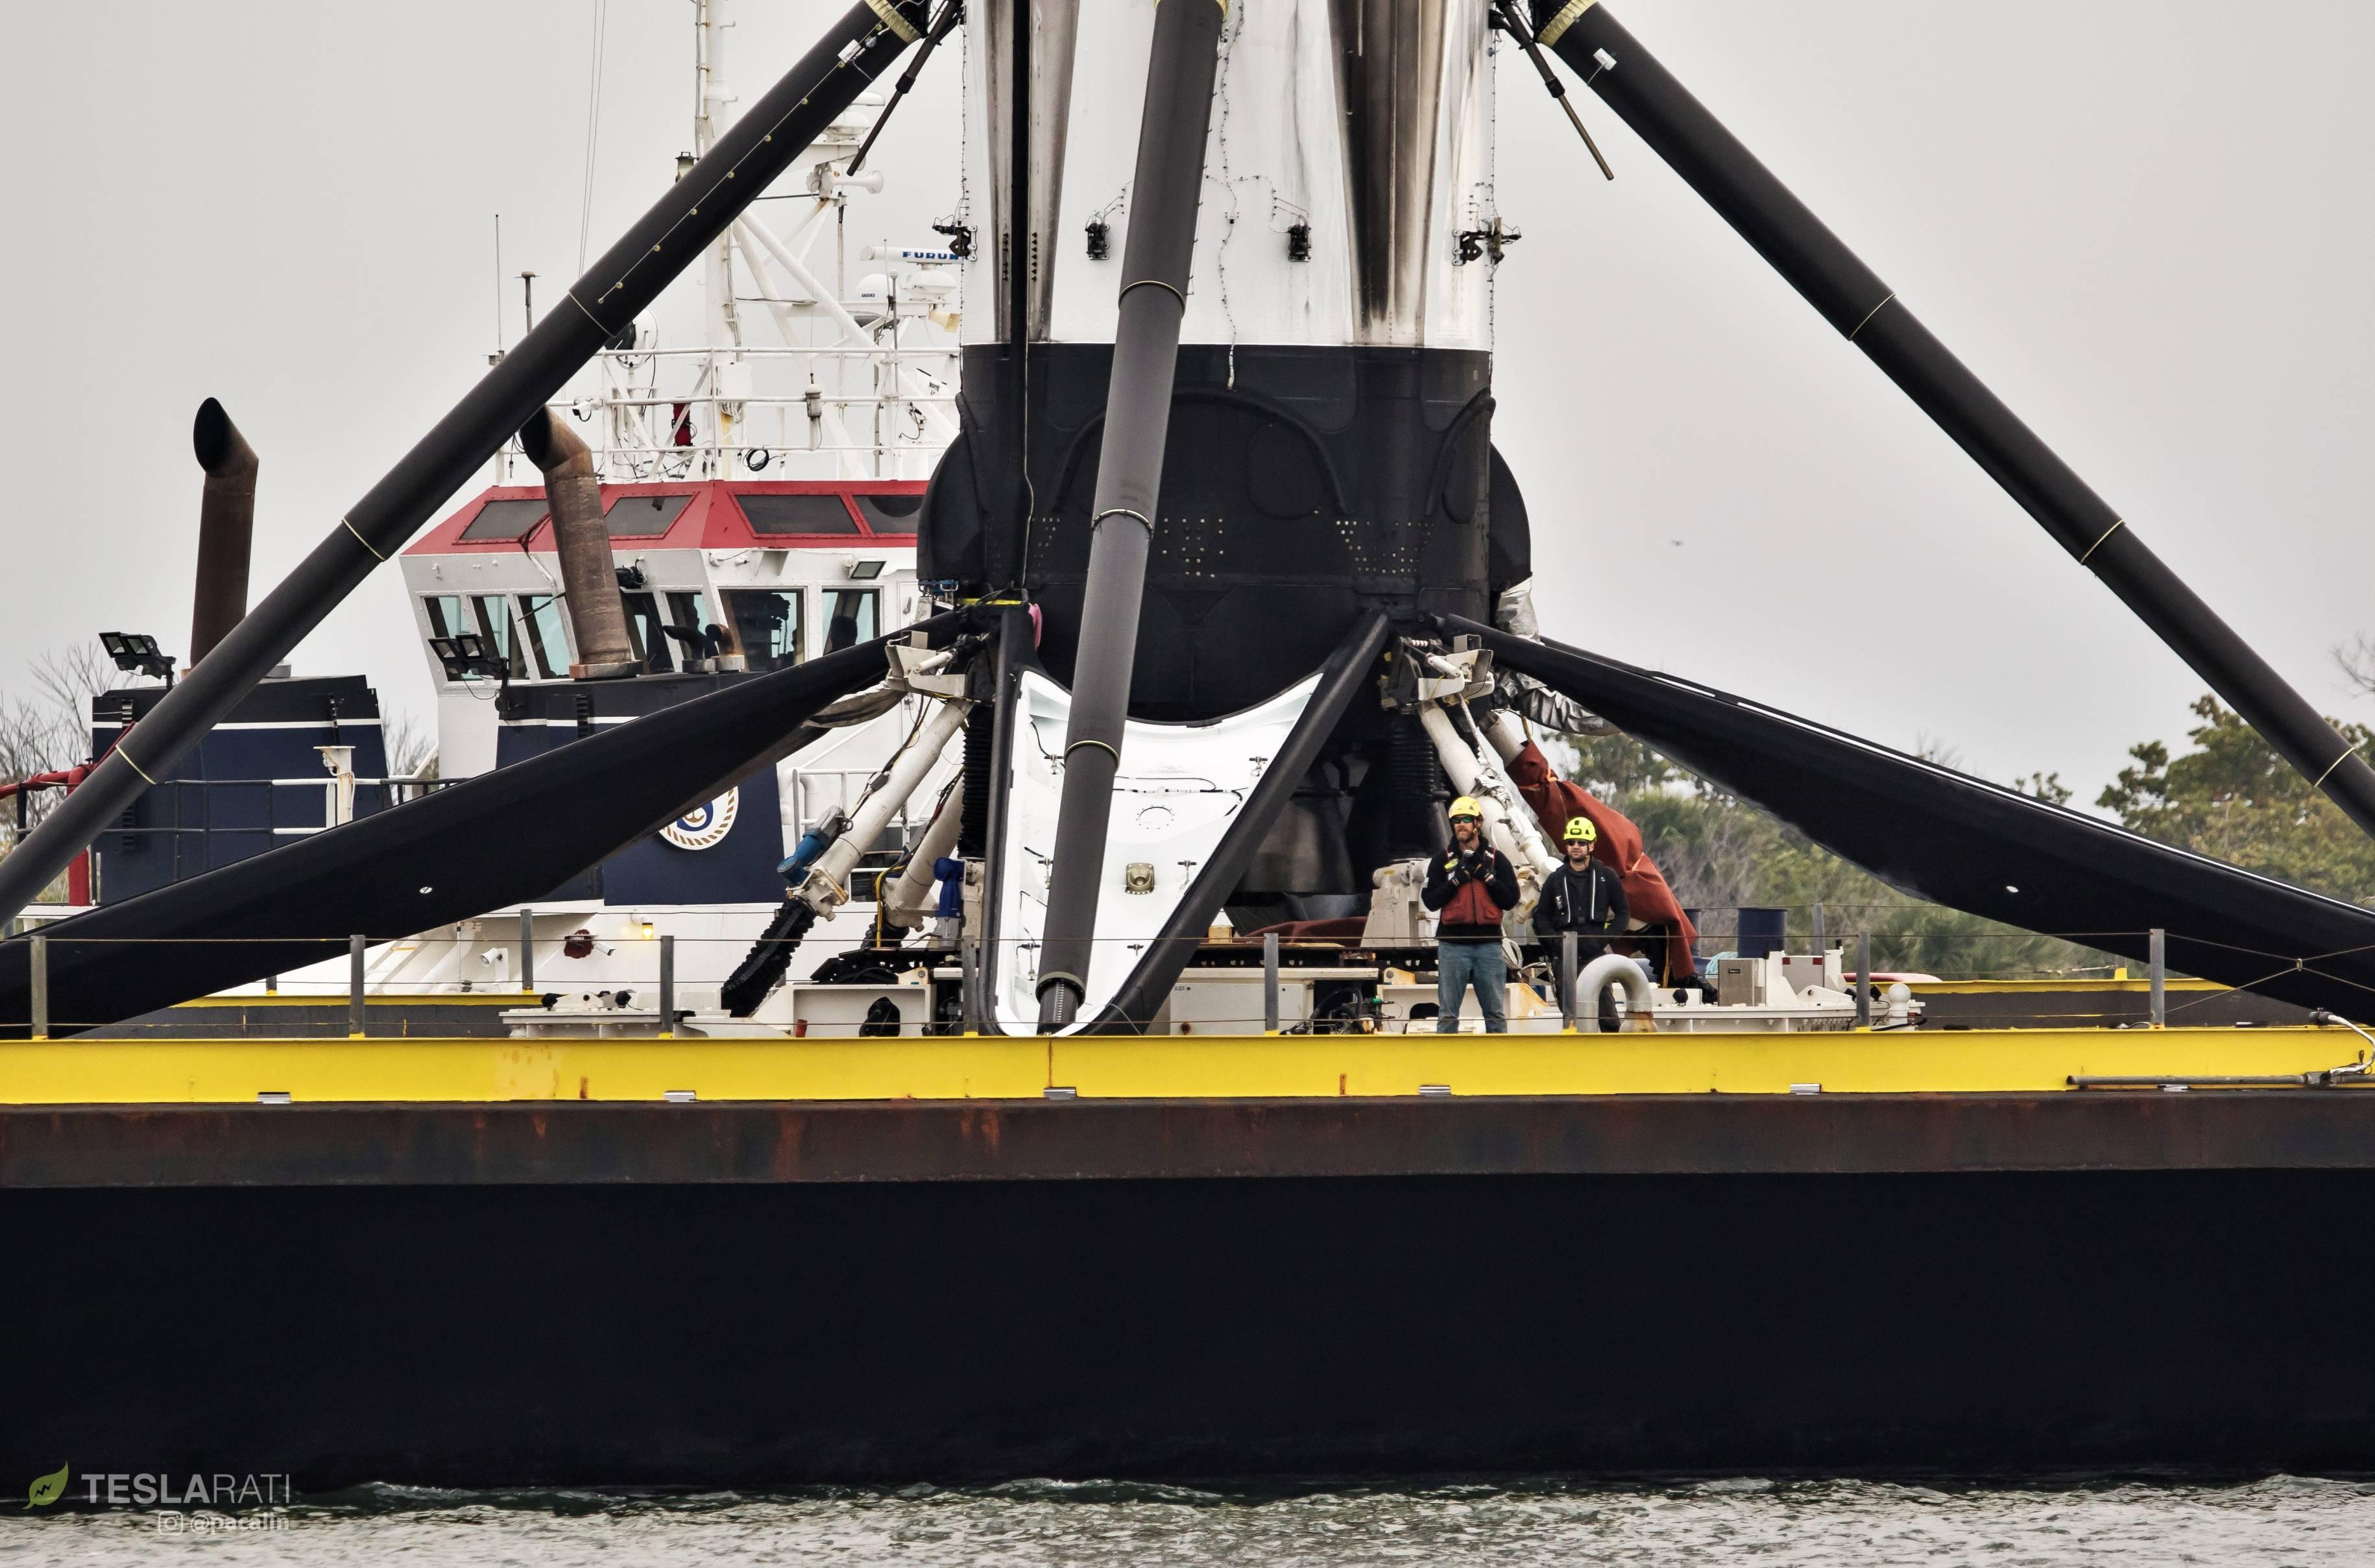 Falcon 9 B1051 DM-1 OCISLY recovery 030519 (Pauline Acalin) 1 edit (c)